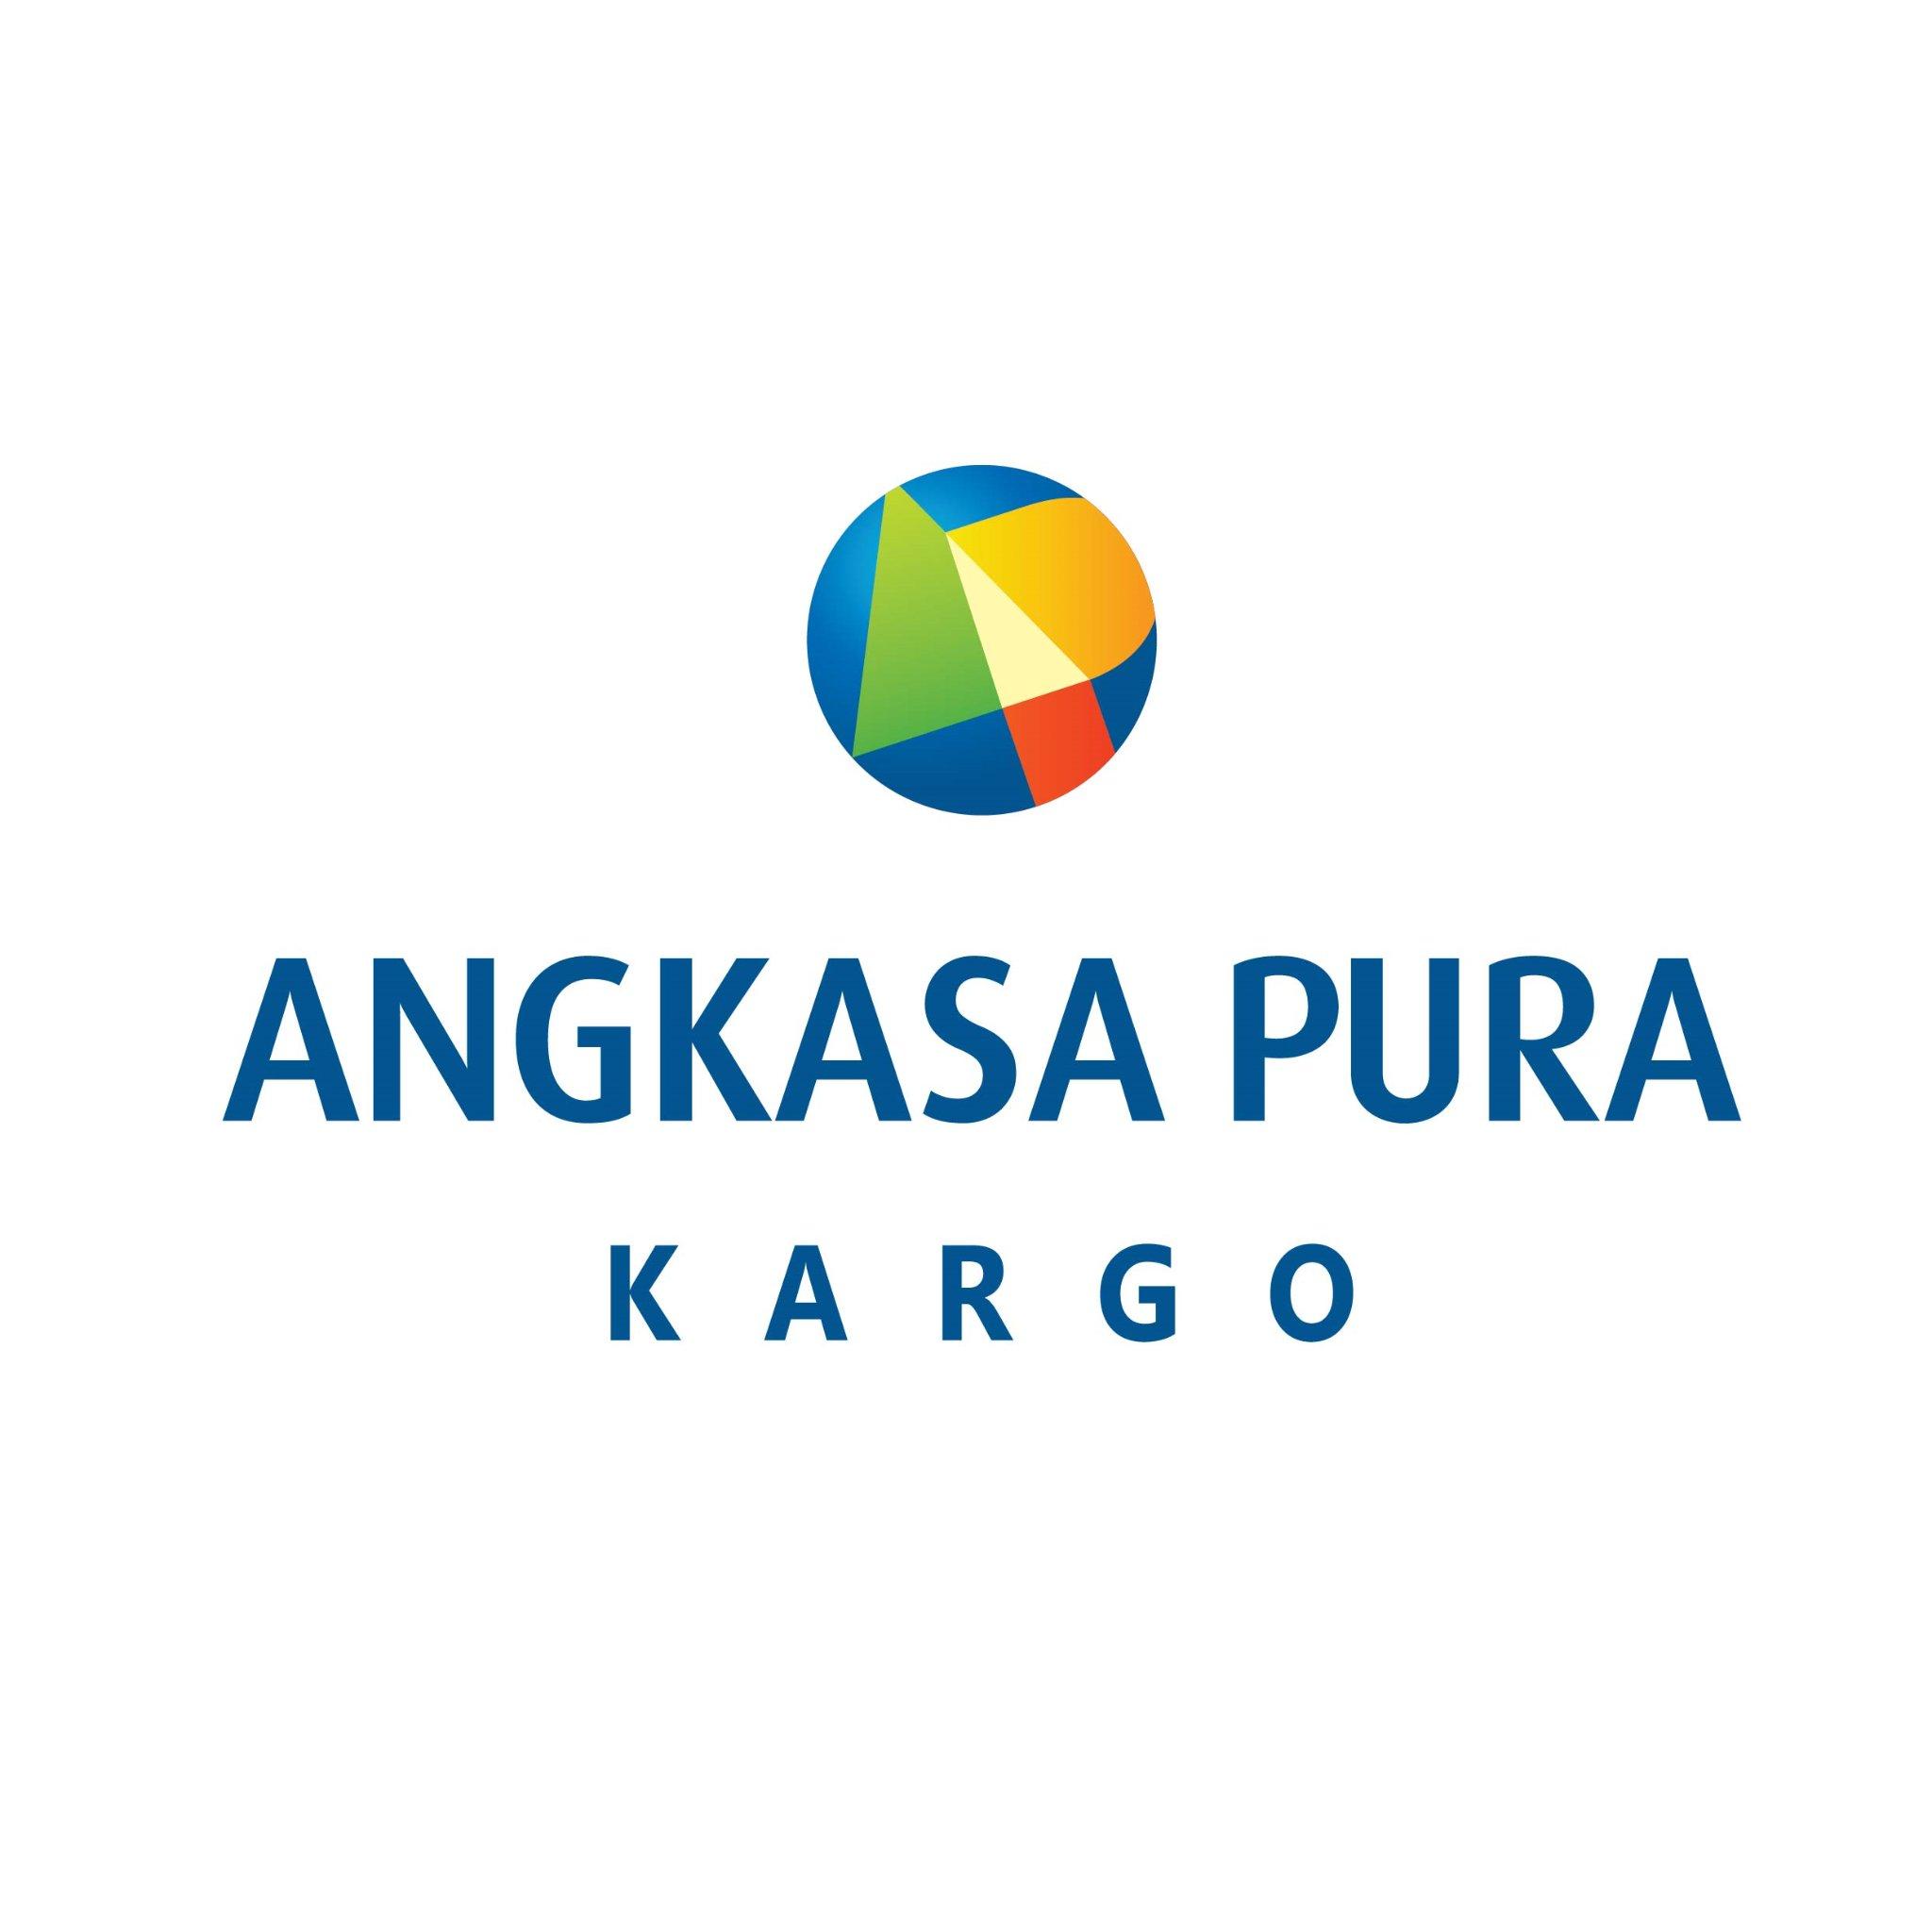 Angkasa Pura Kargo